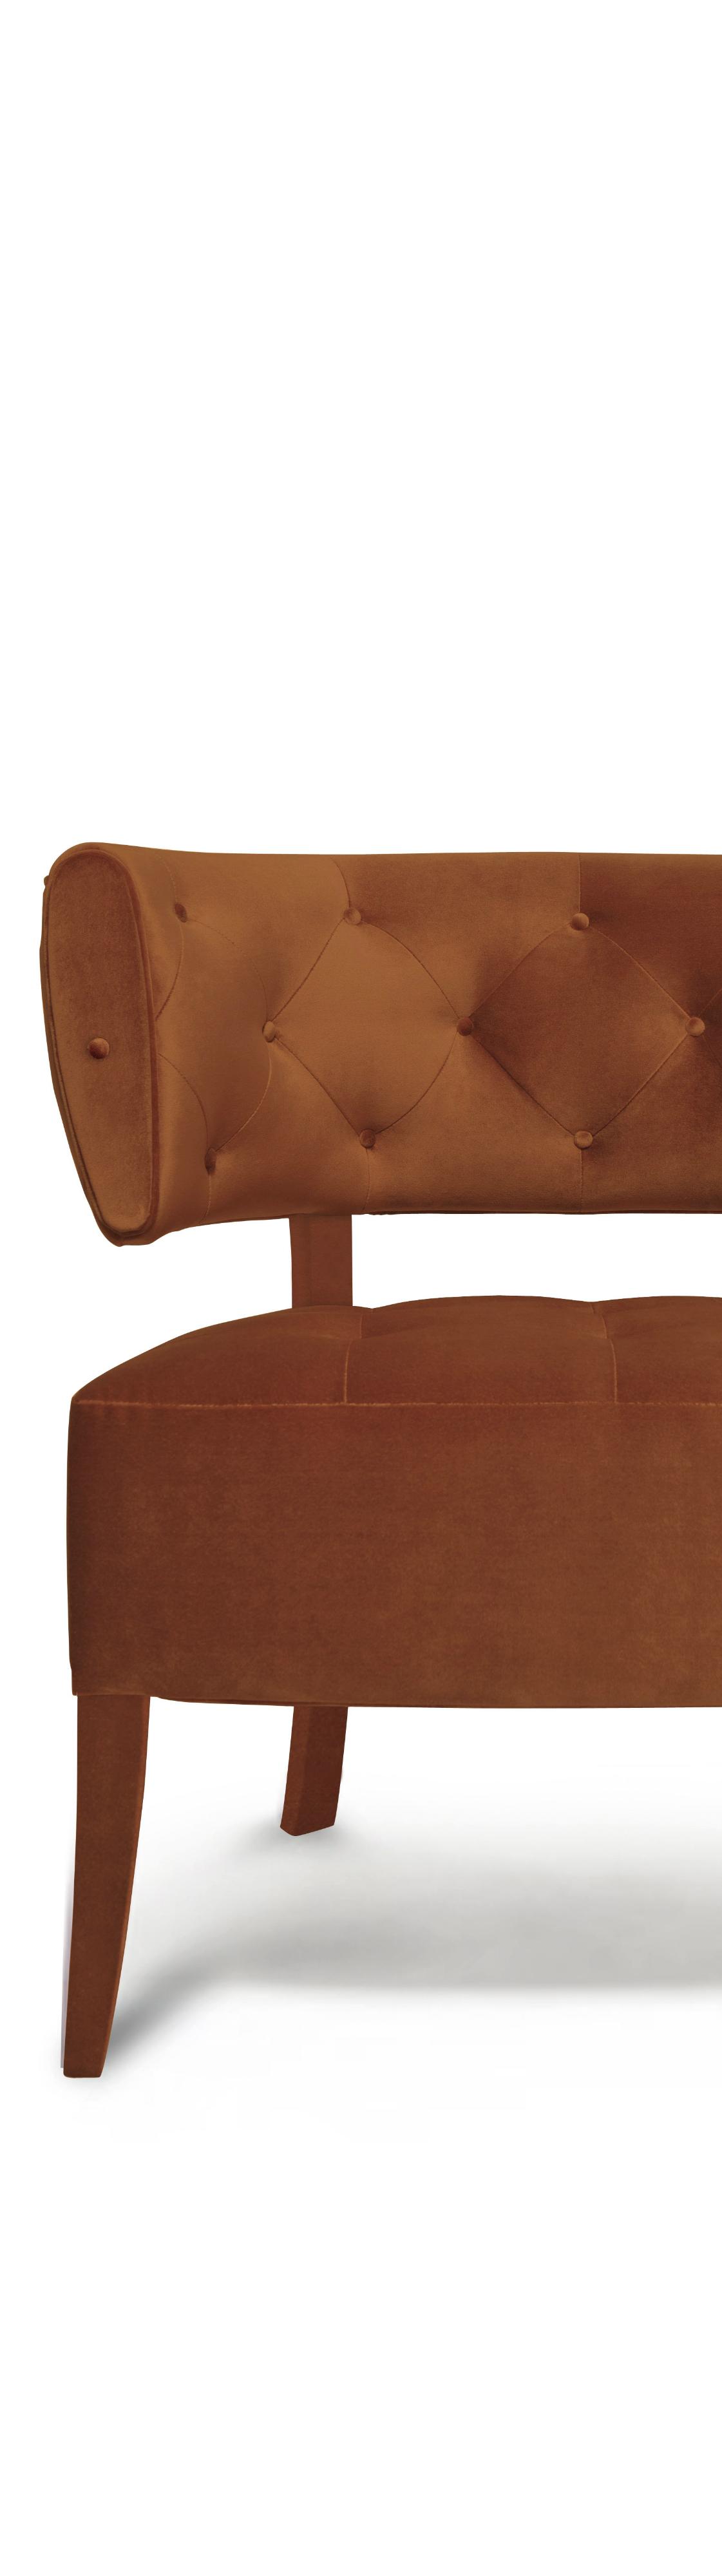 Inspirational interior design with Zulu!